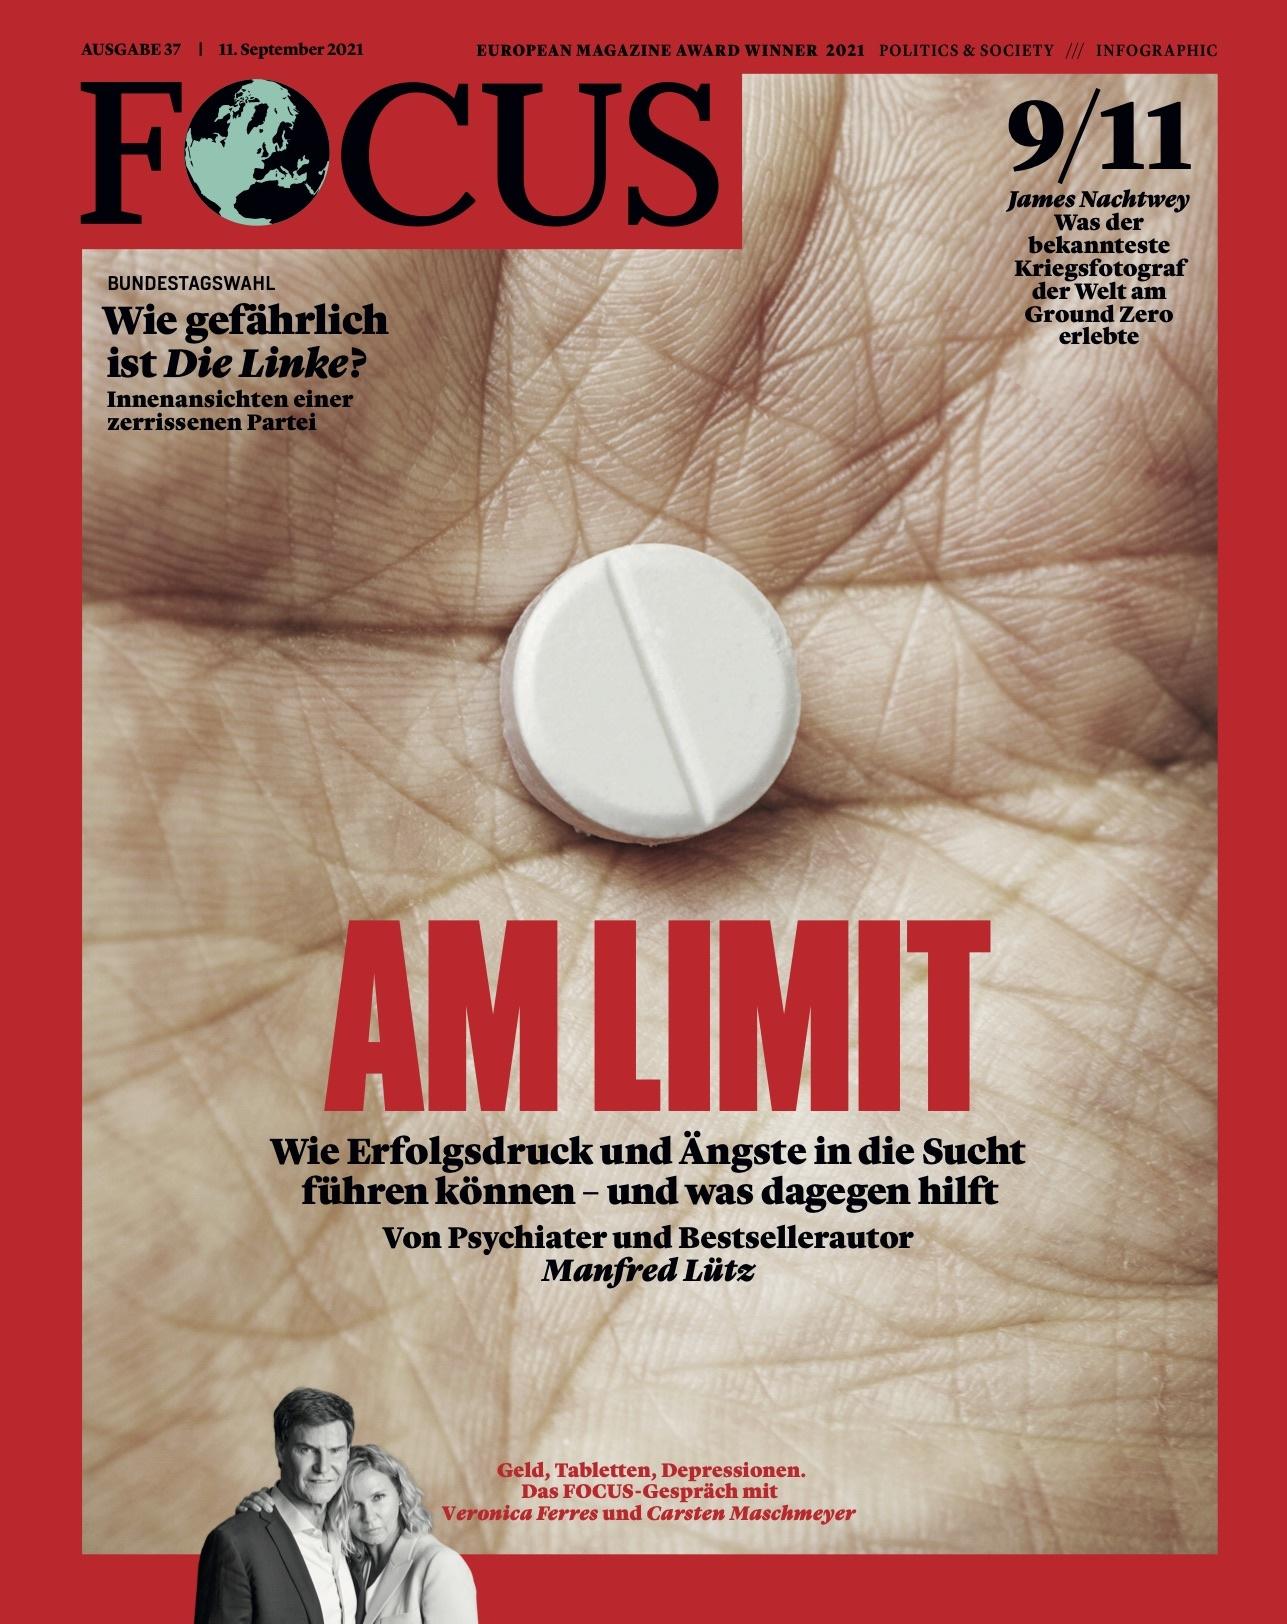 FOCUS Magazin FOCUS Magazin - Am Limit